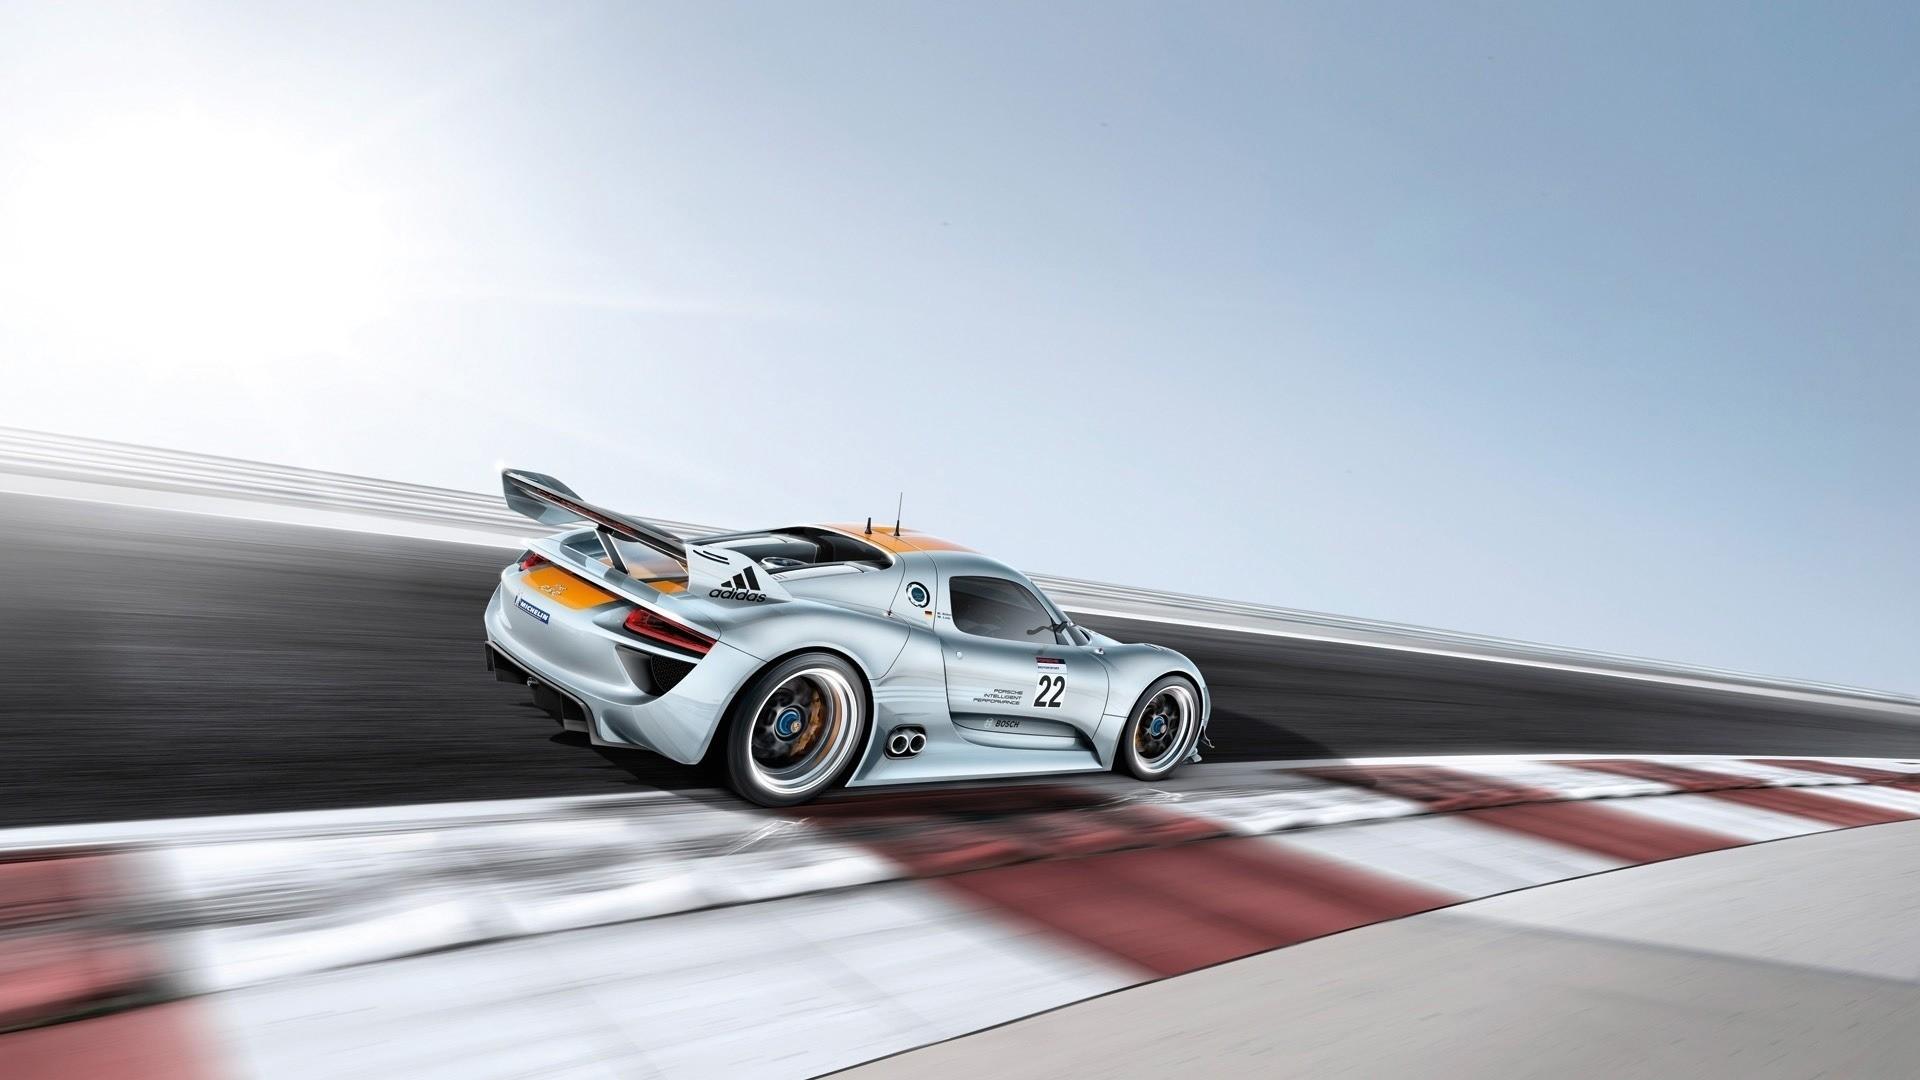 Free Ridge Racer 7 Wallpaper In 1280x800: Speed Racer Wallpapers (53+ Images